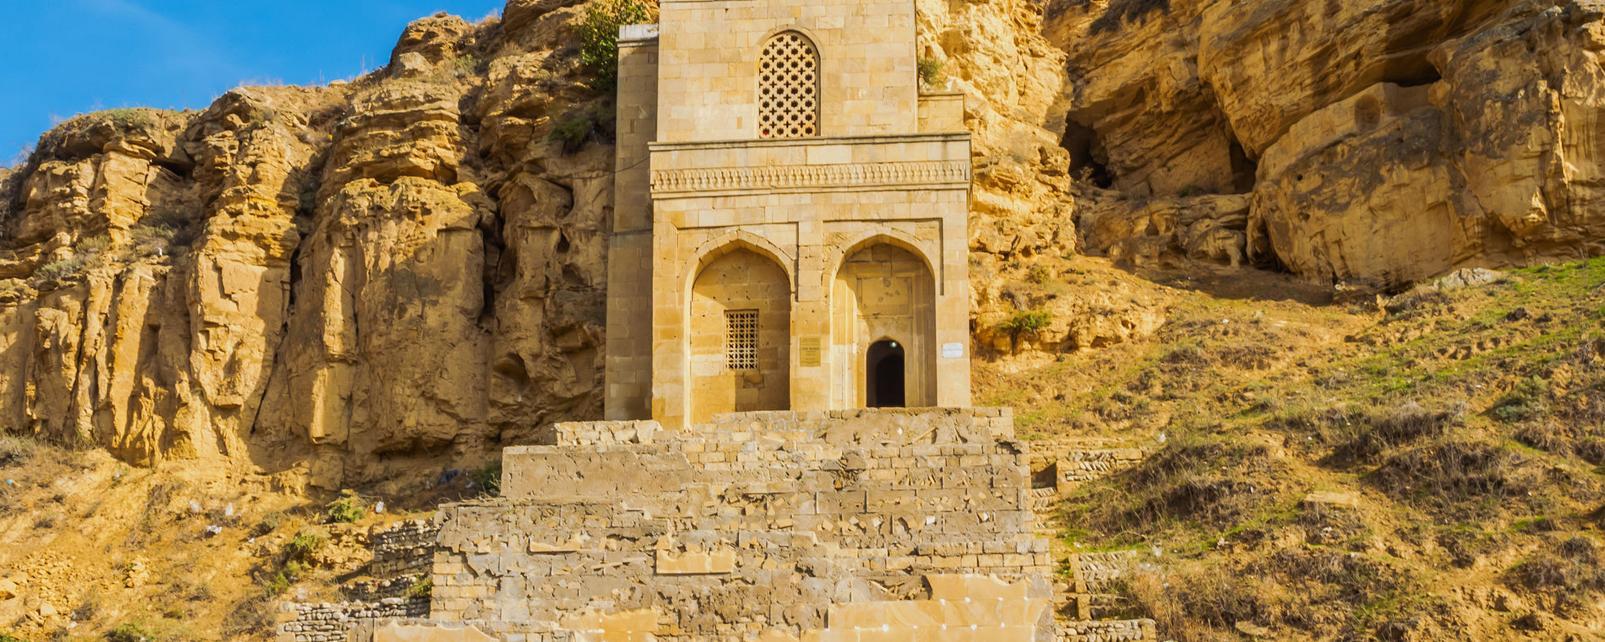 Asie, Azerbaïdjan, Gobustan Rayon, mausolée, Diri Baba Maraza, religion,